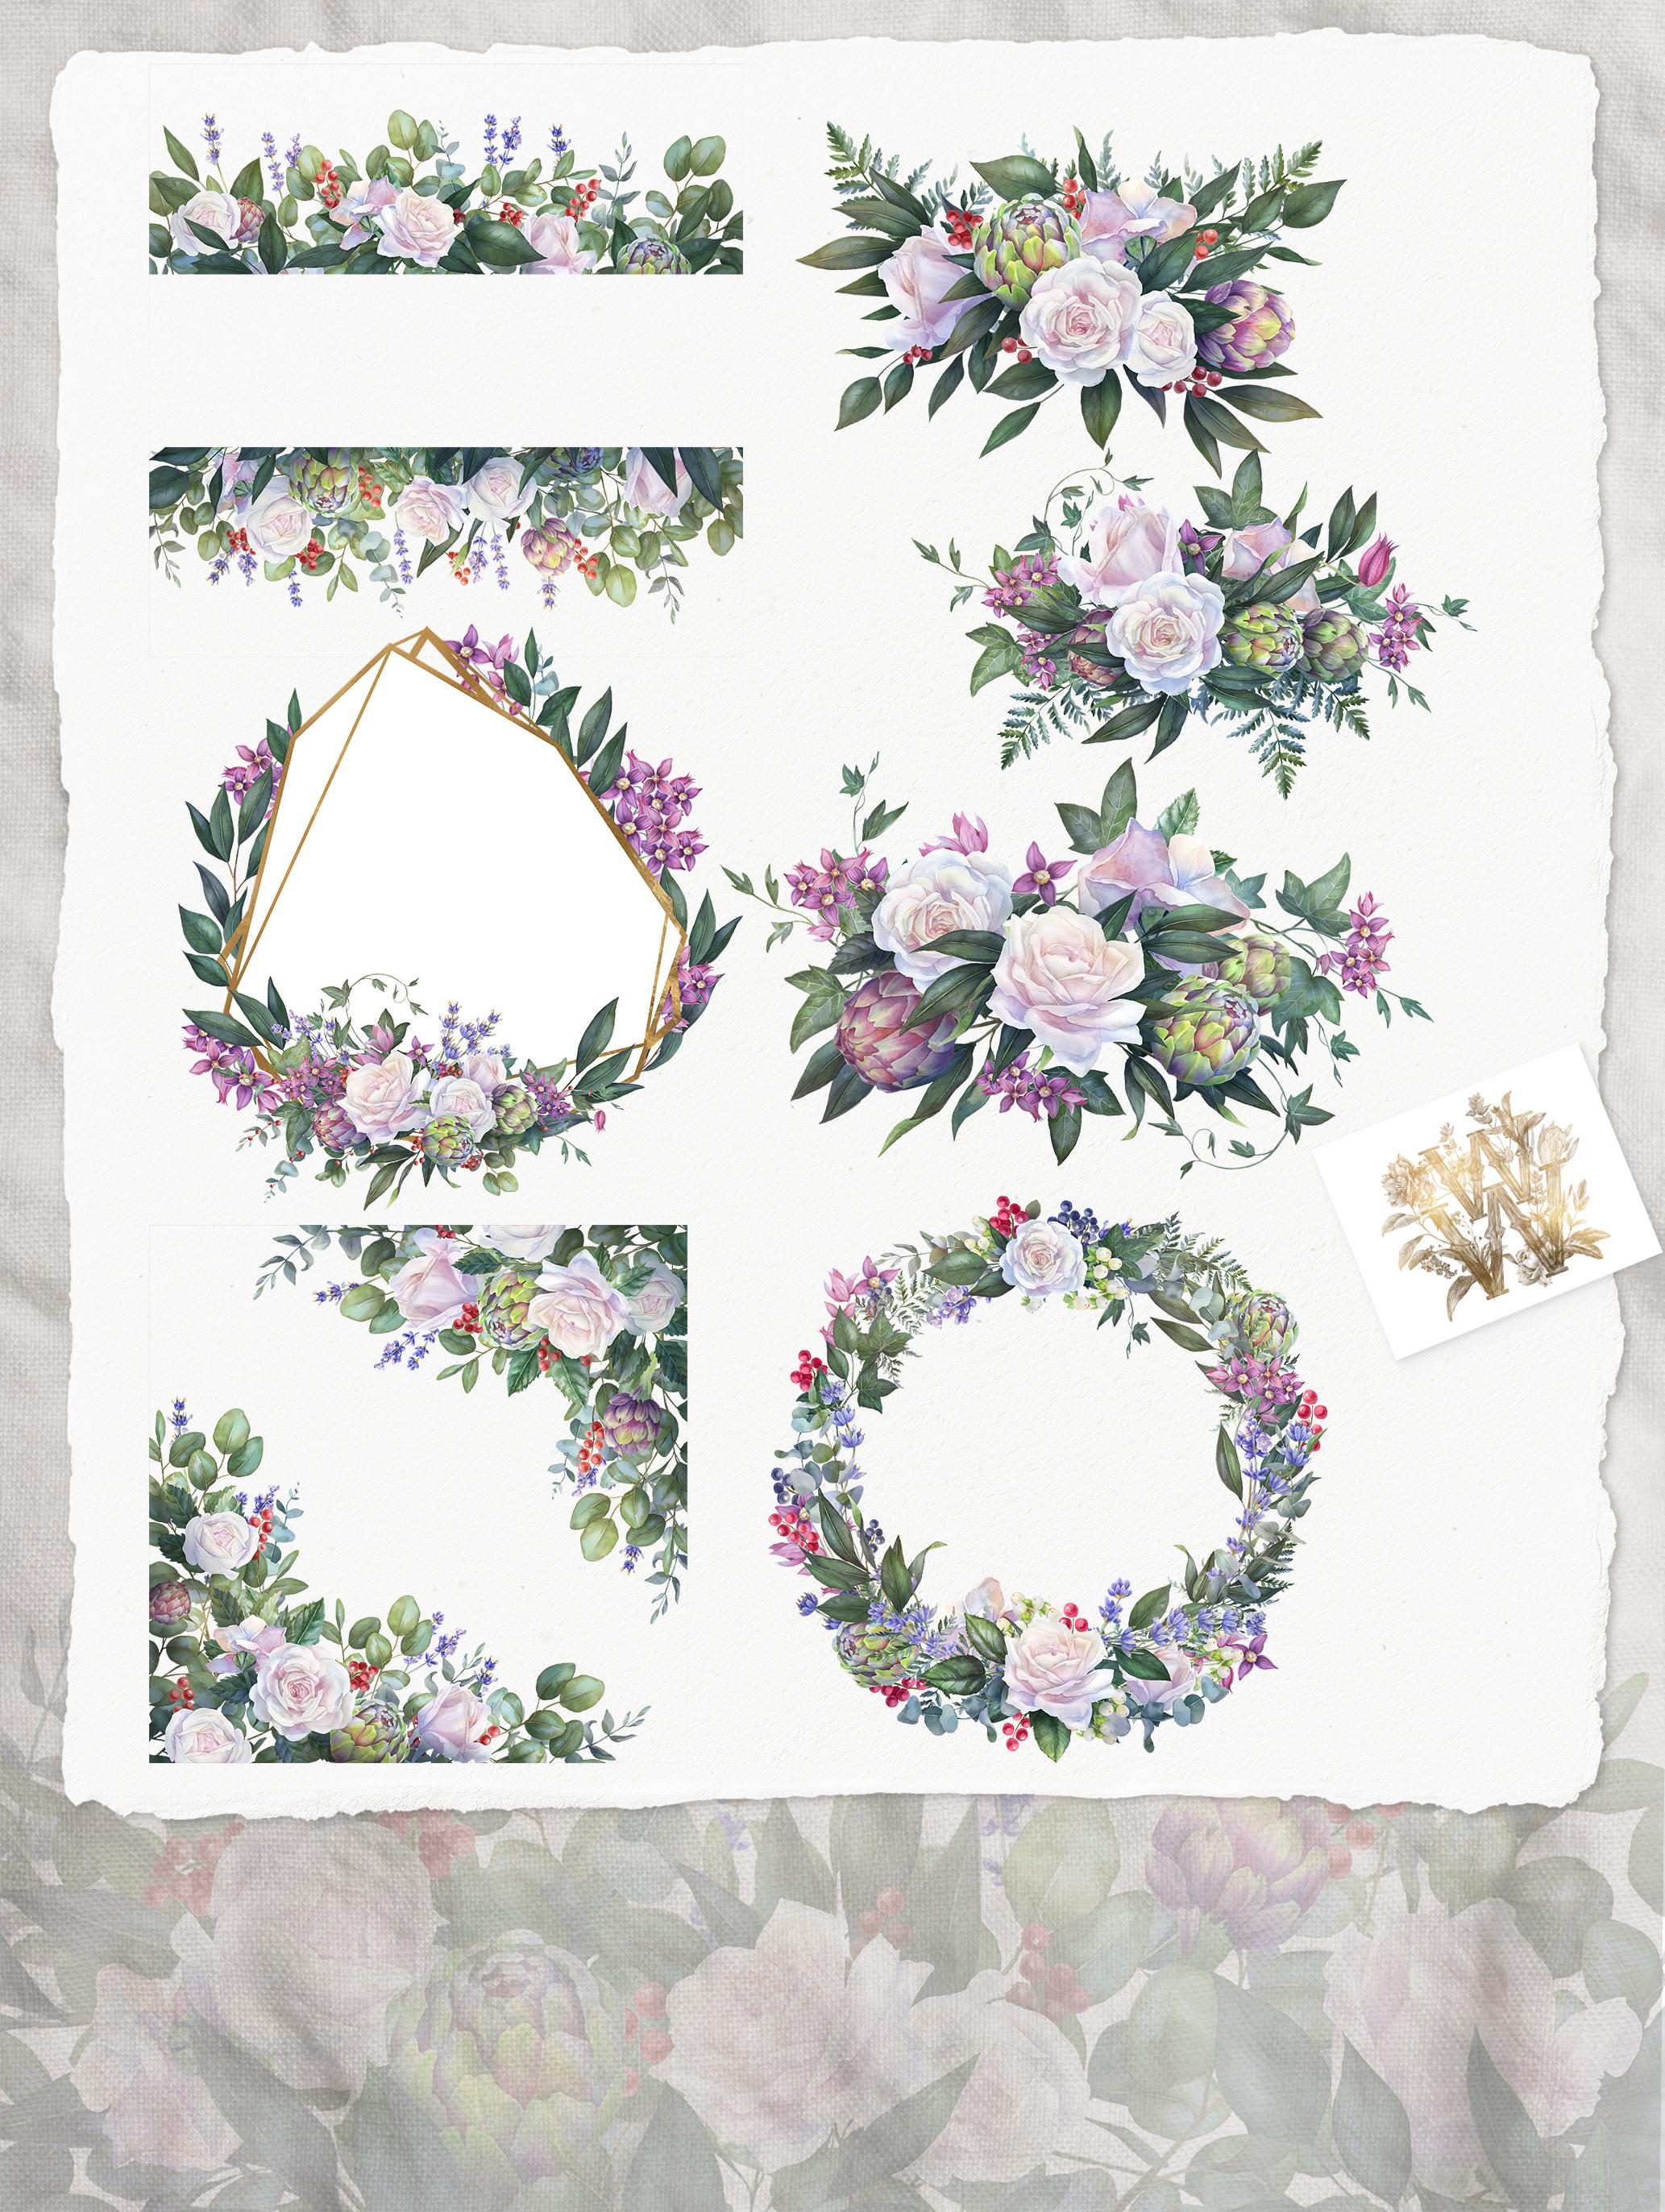 White rose wedding frame clip art example image 2